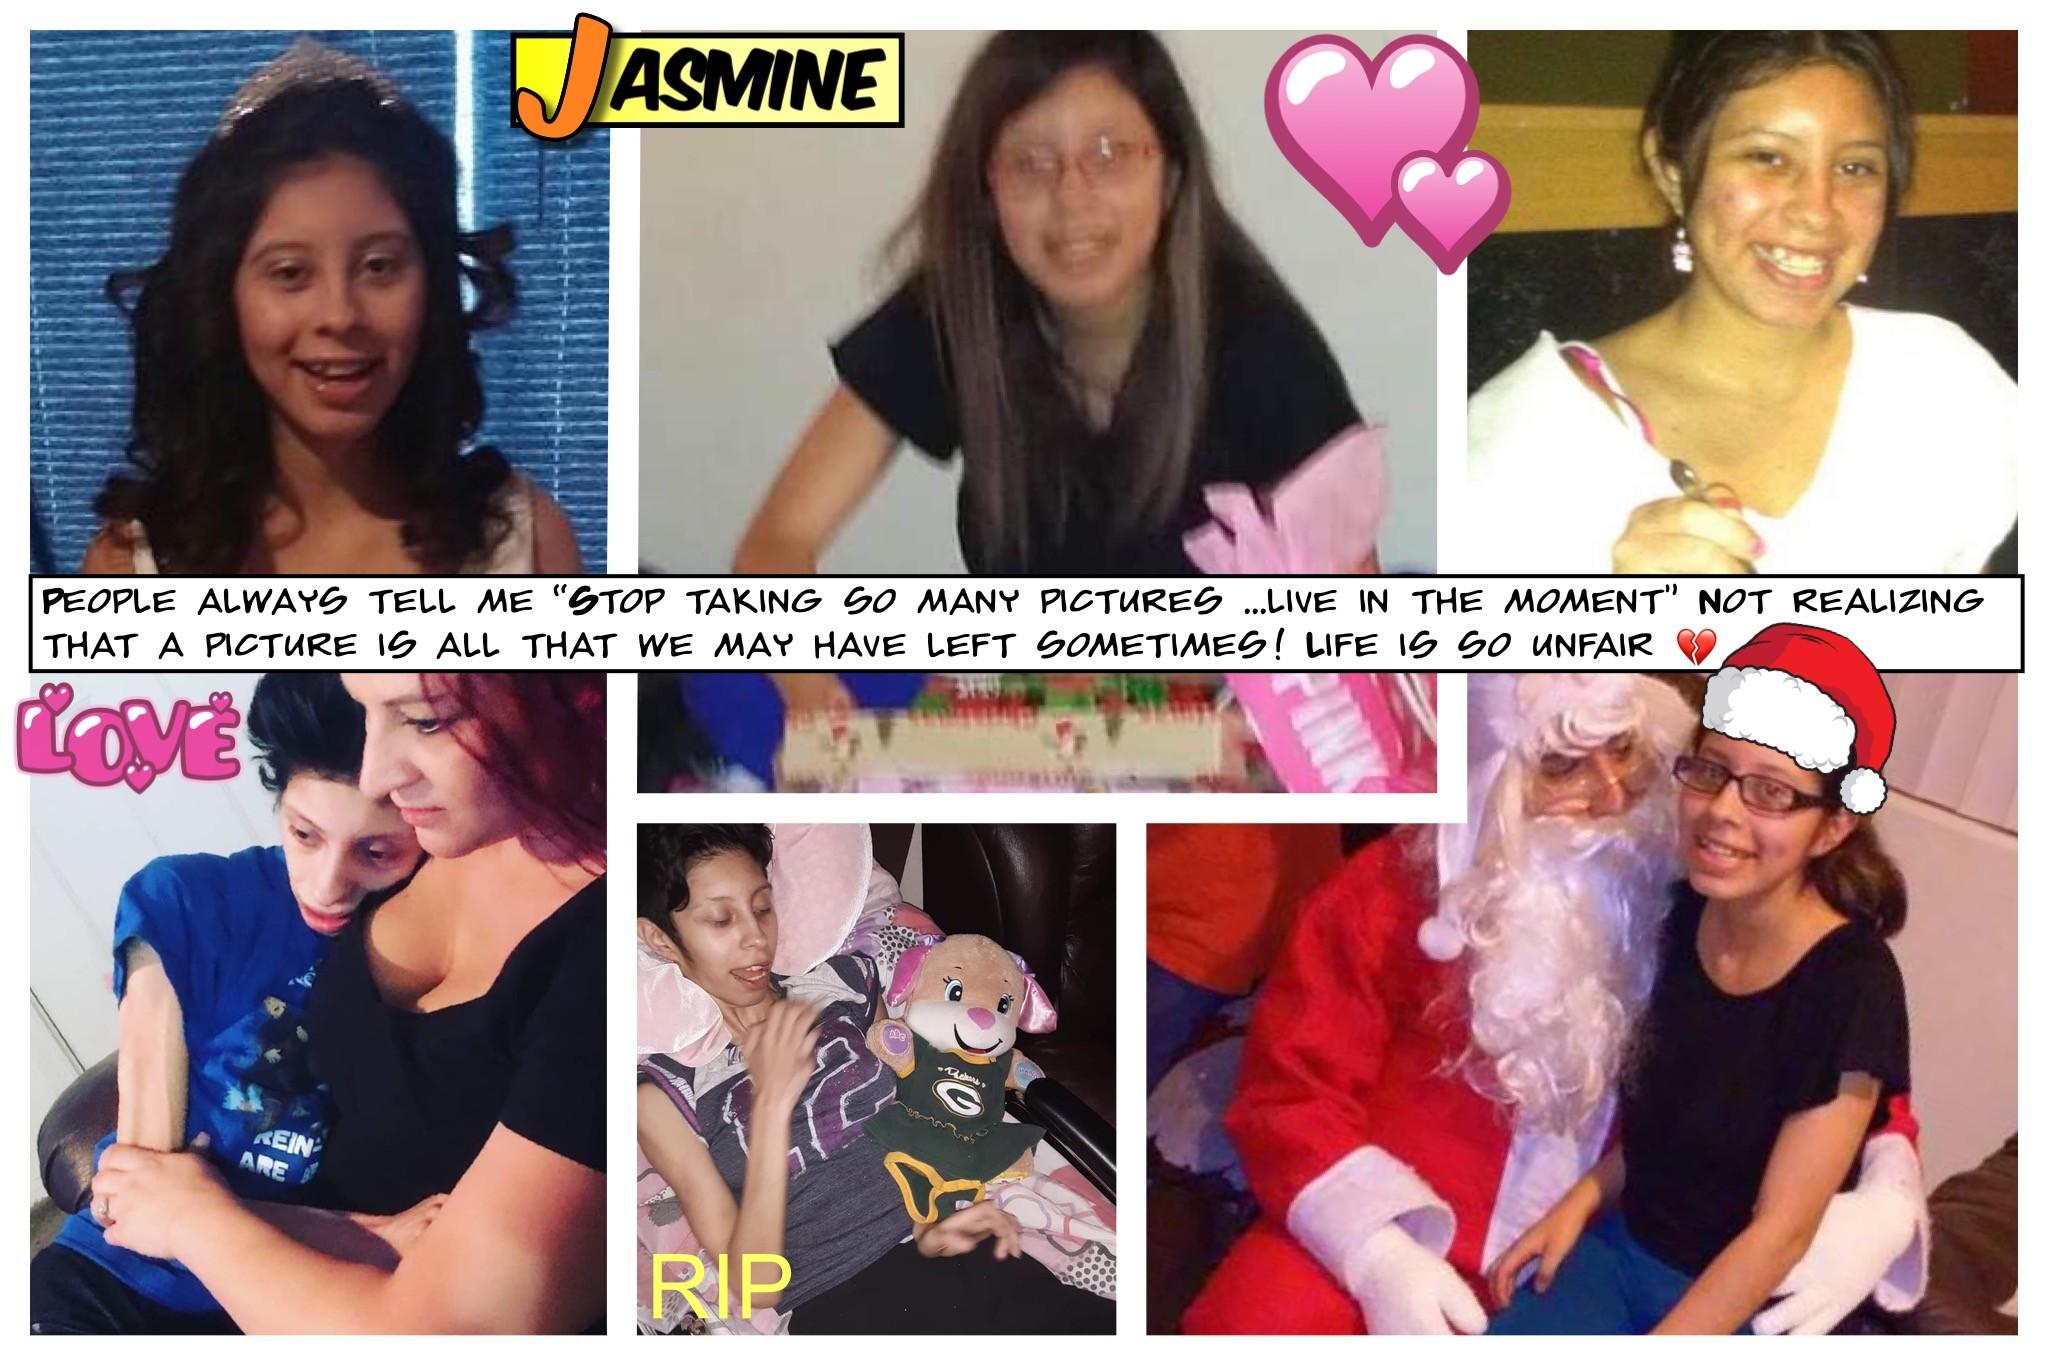 jasmine photos